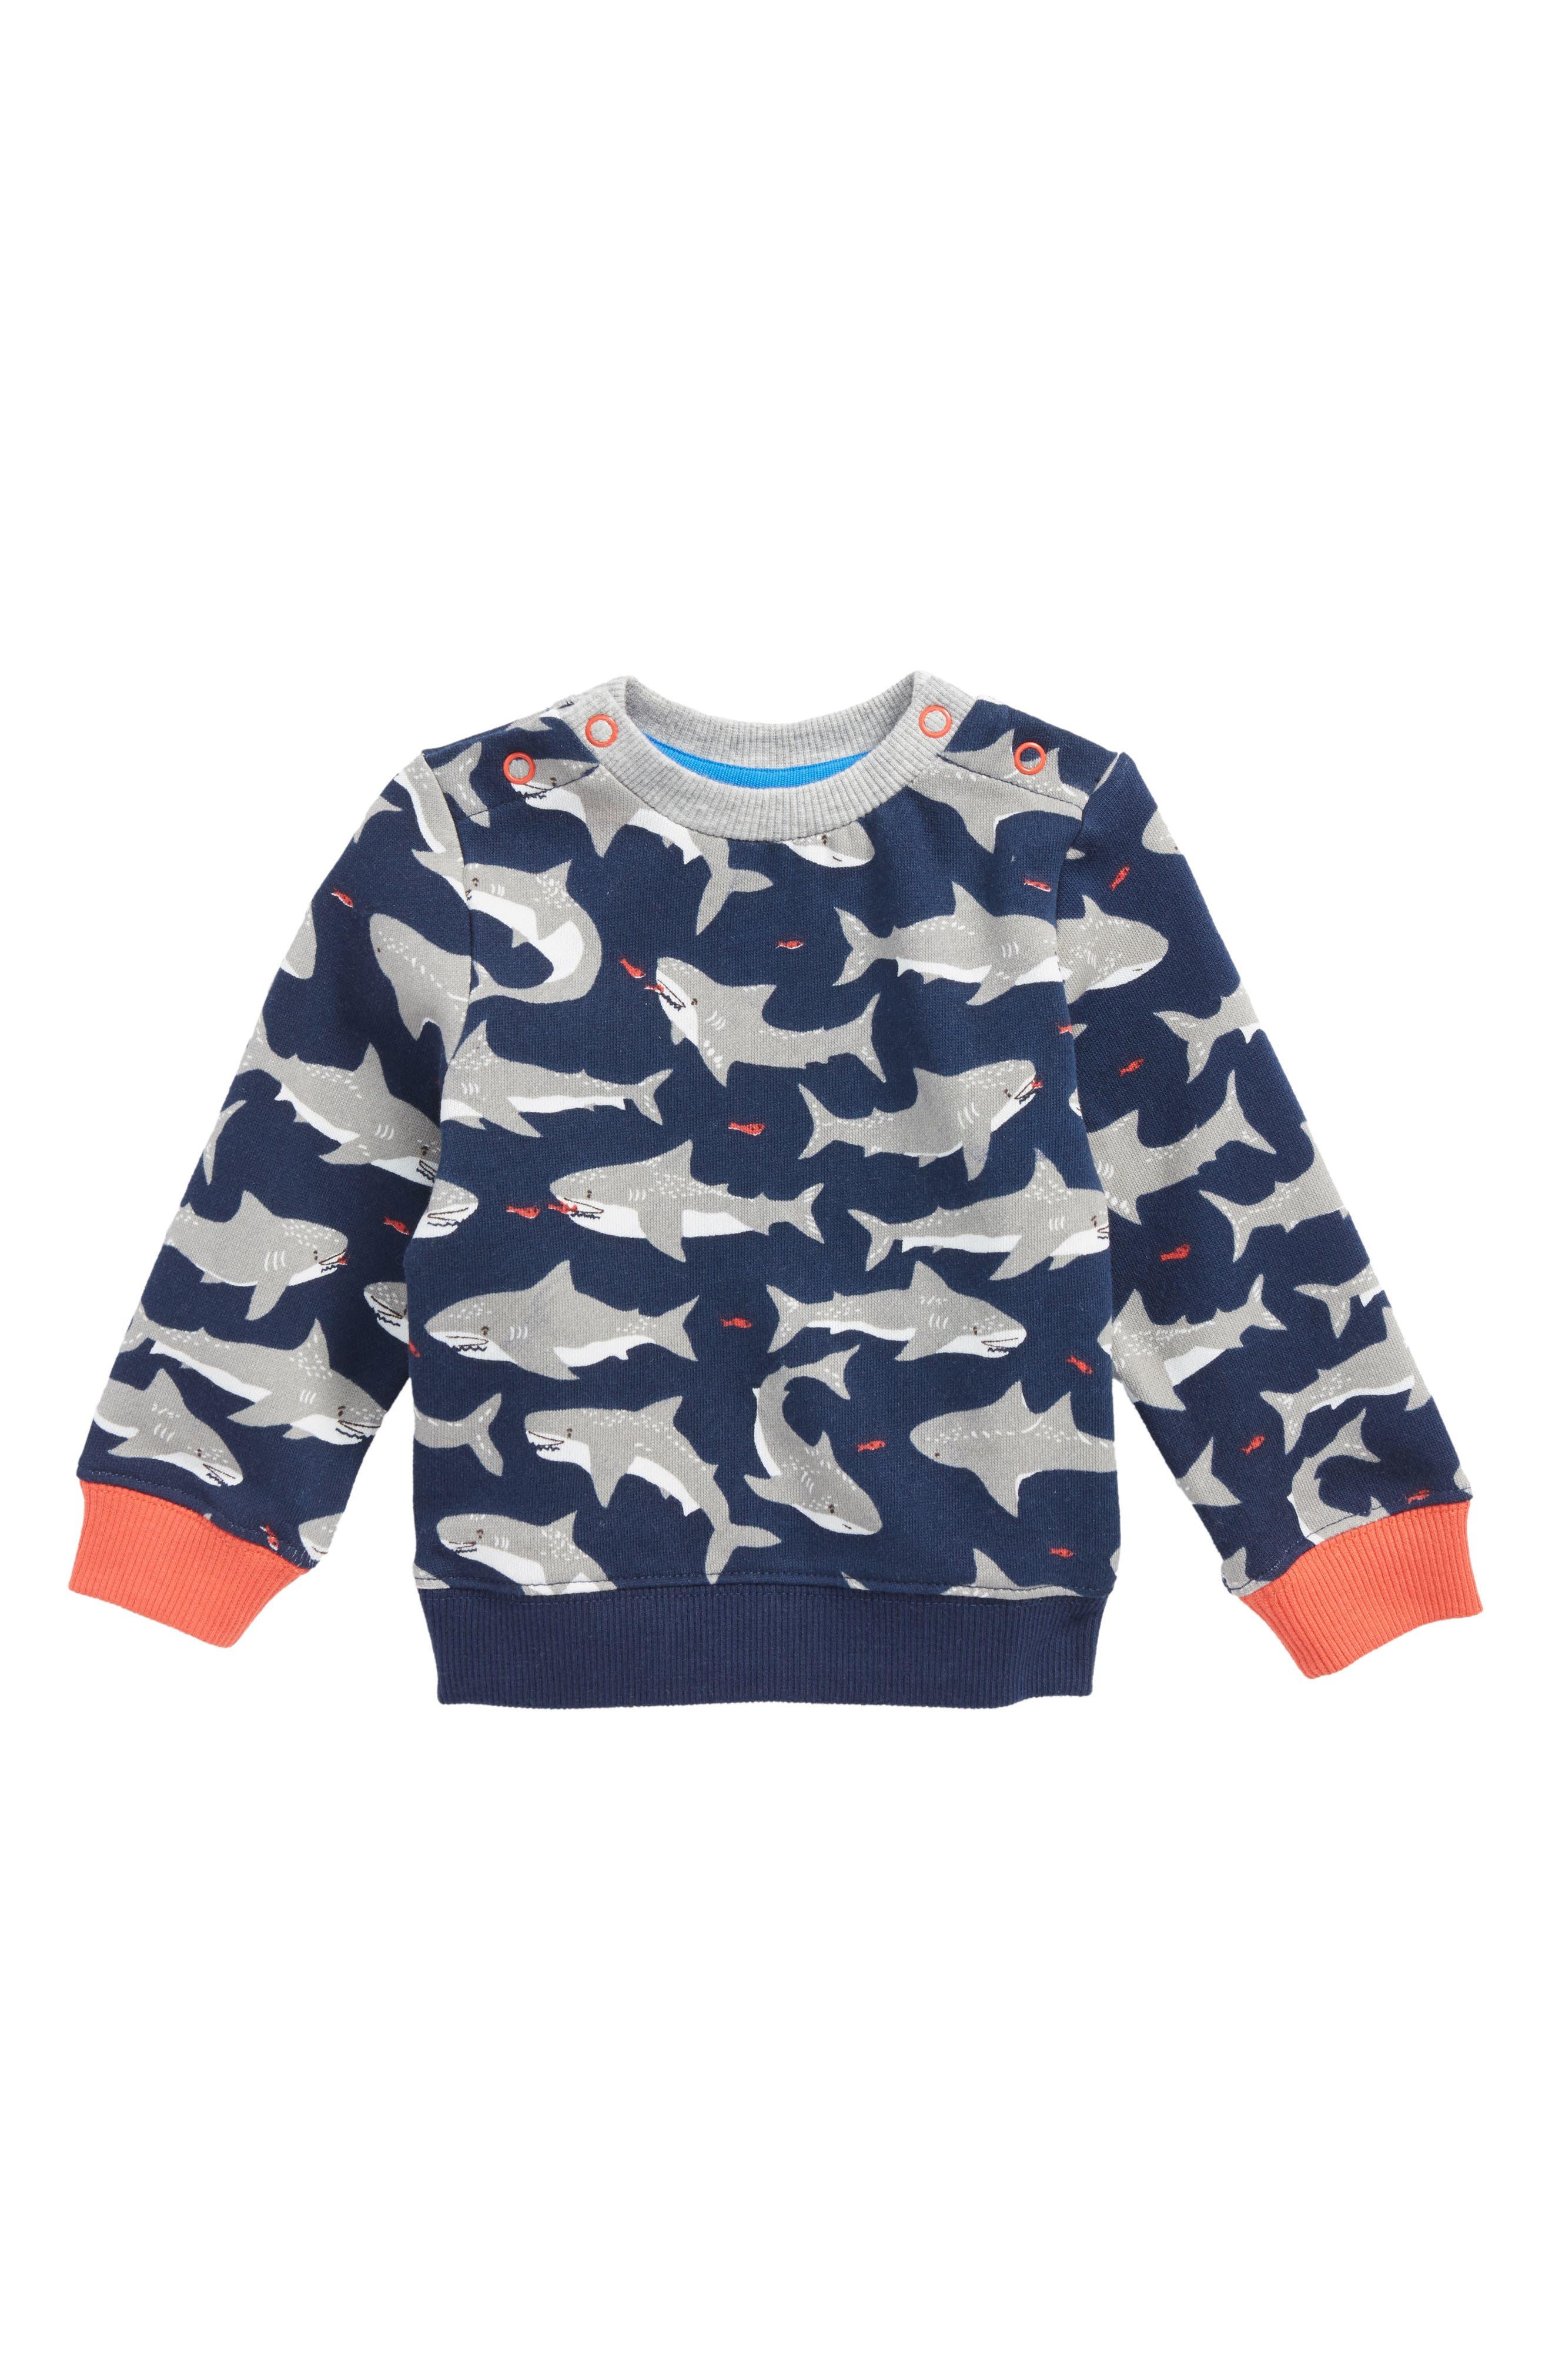 Cozy Shark Sweatshirt,                             Main thumbnail 1, color,                             404